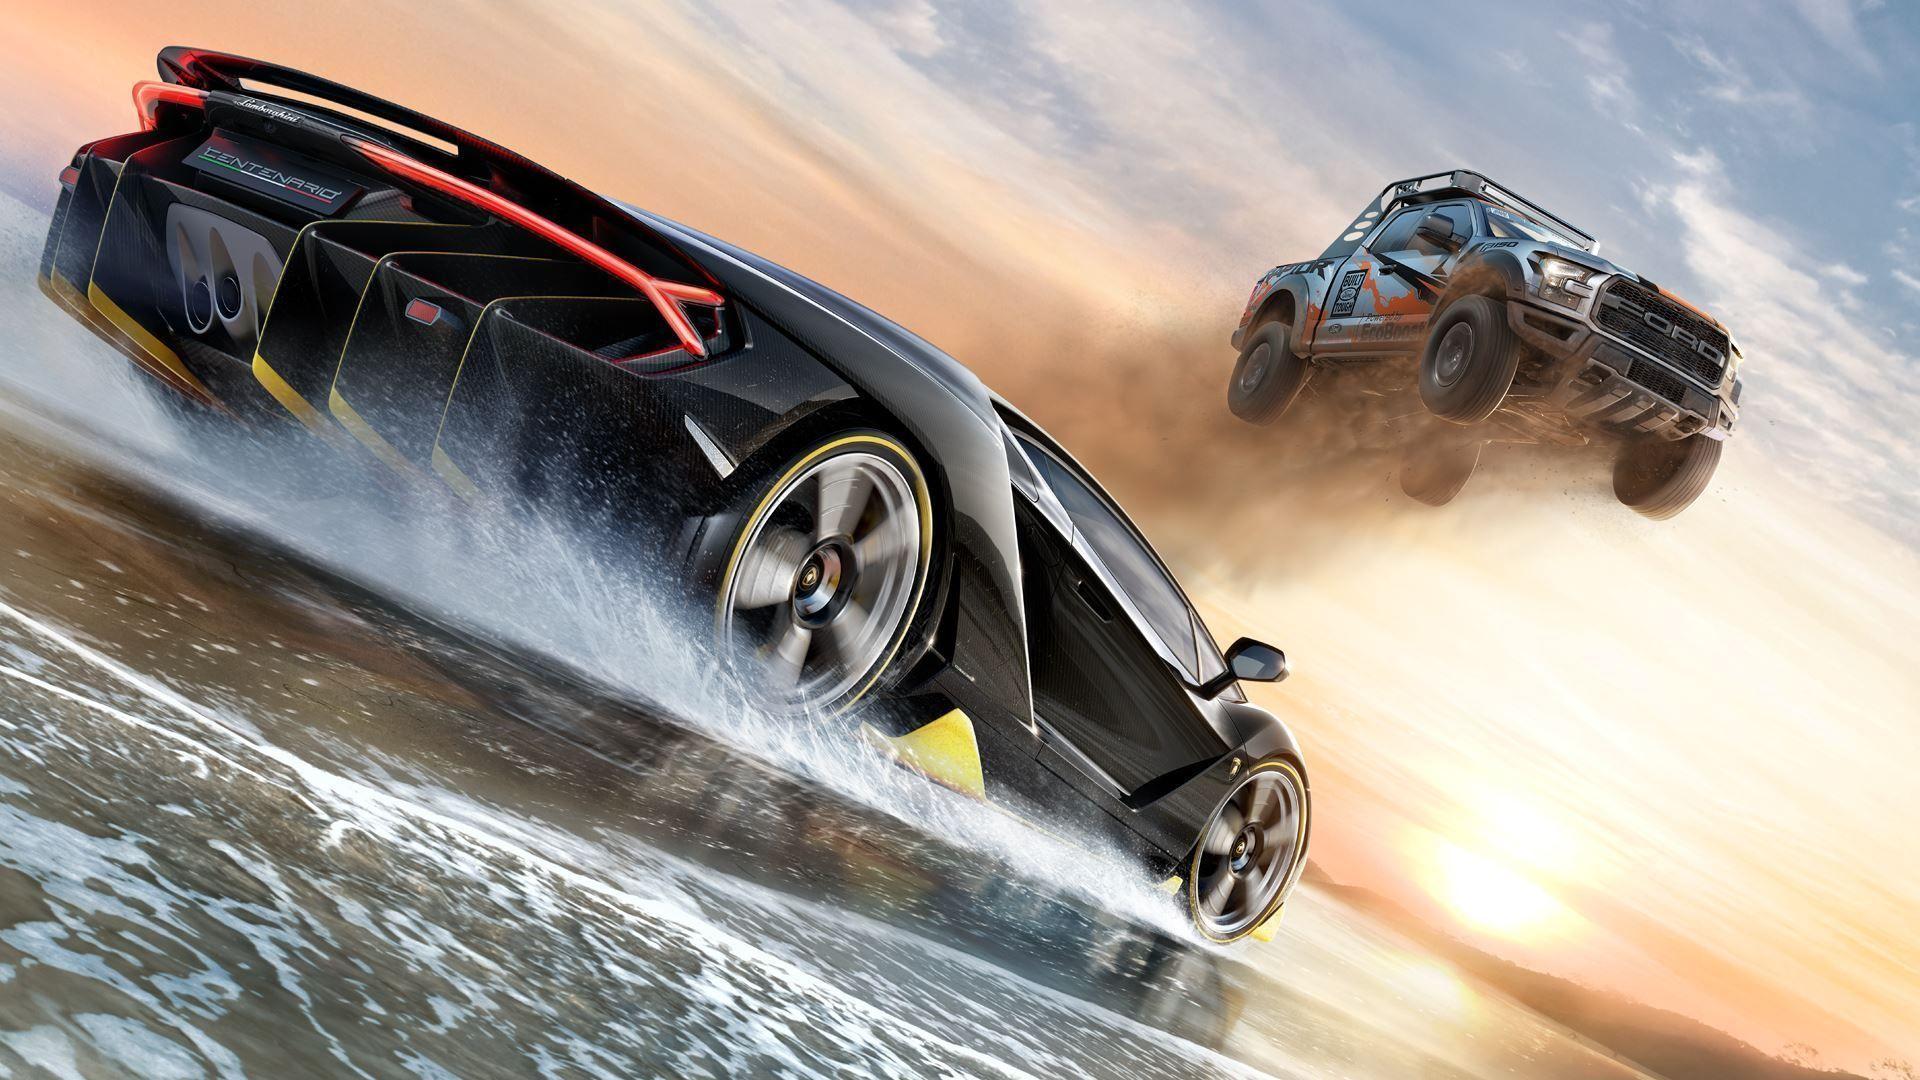 Wallpaper HD Forza Horizon 3 Forza XboxOne ForzaHorizon3 Games